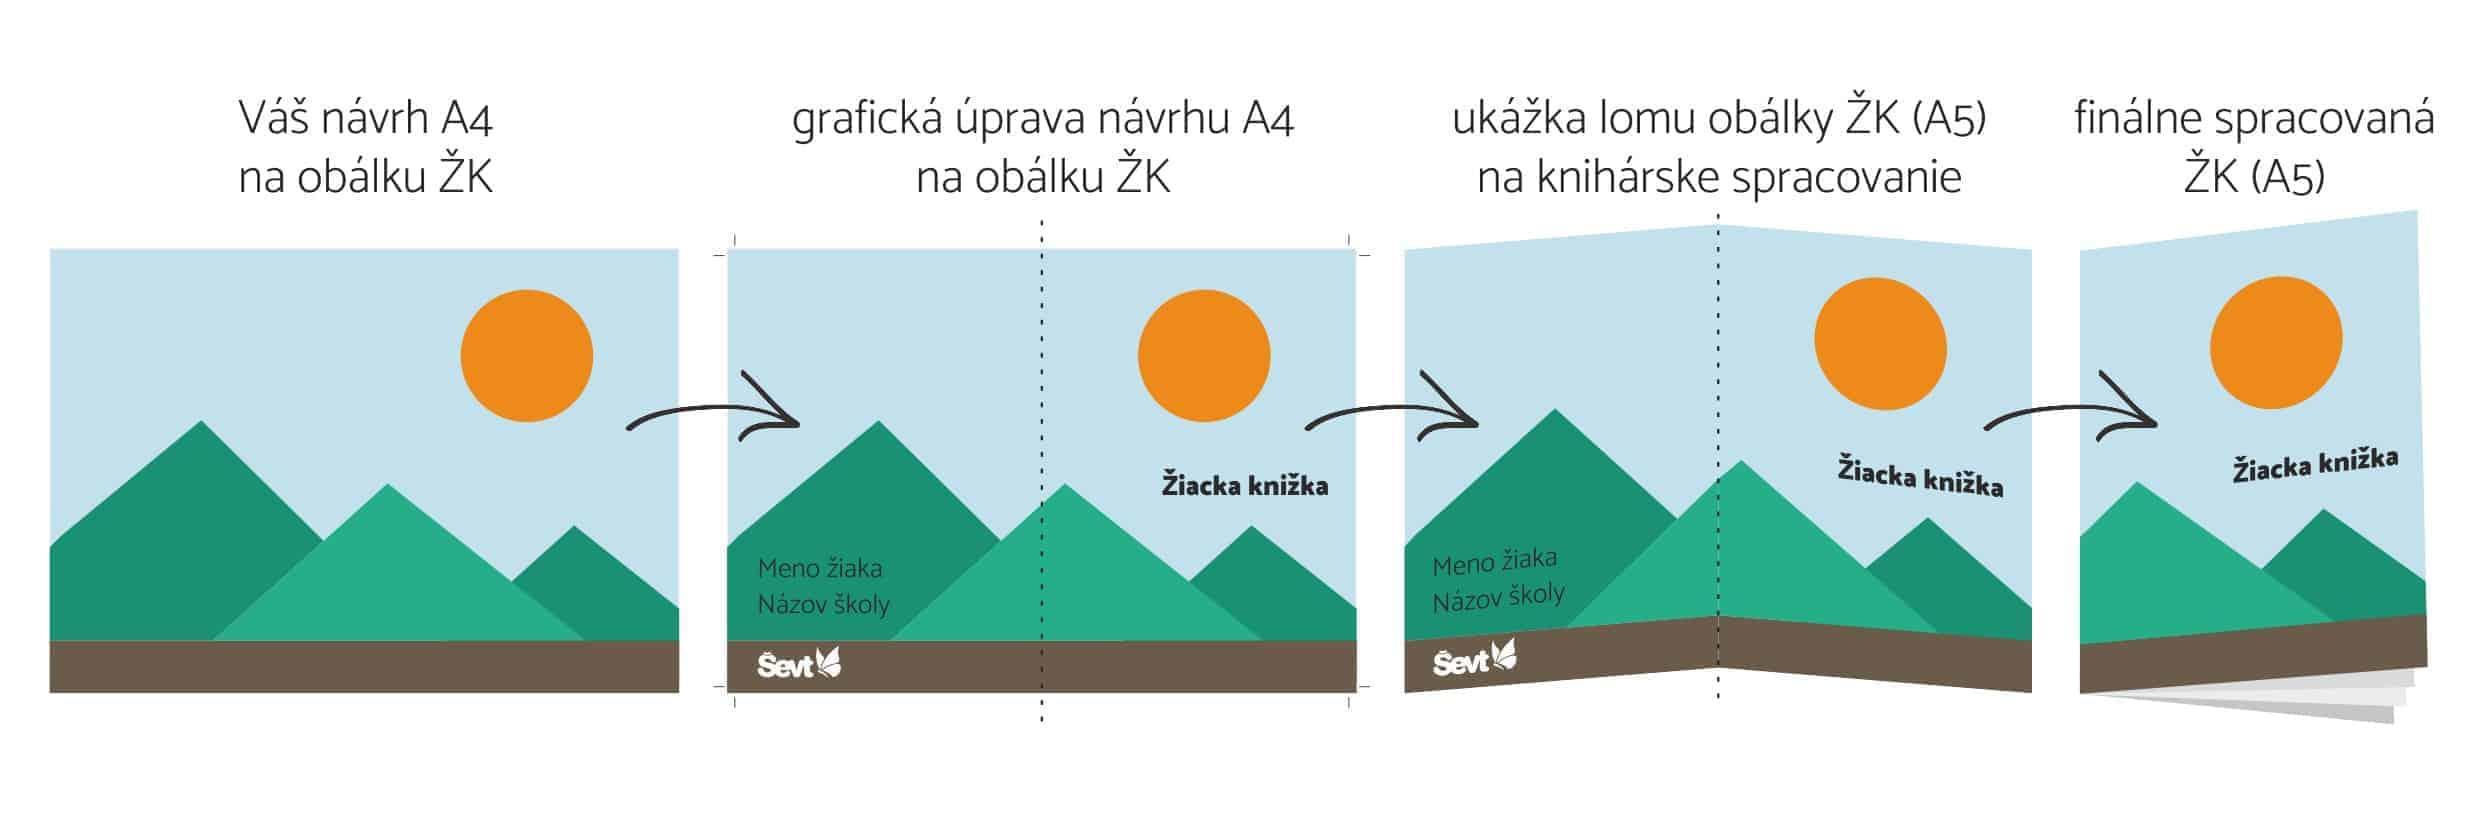 sevt-ziacka-knizka-a4-a5